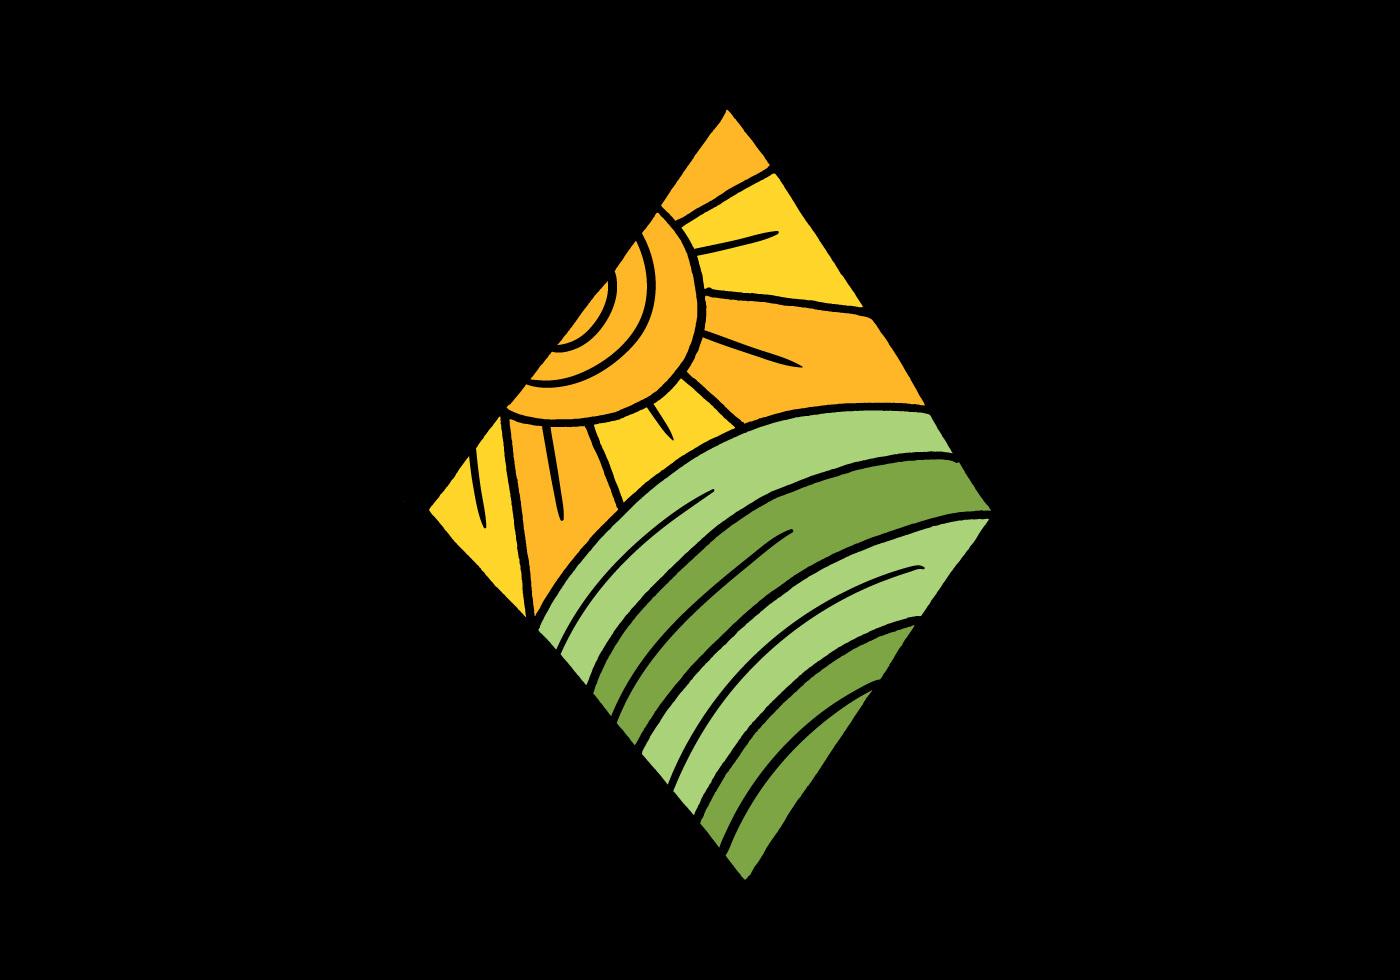 Minimal outdoor diamond badge download free vector art for Minimal art vector